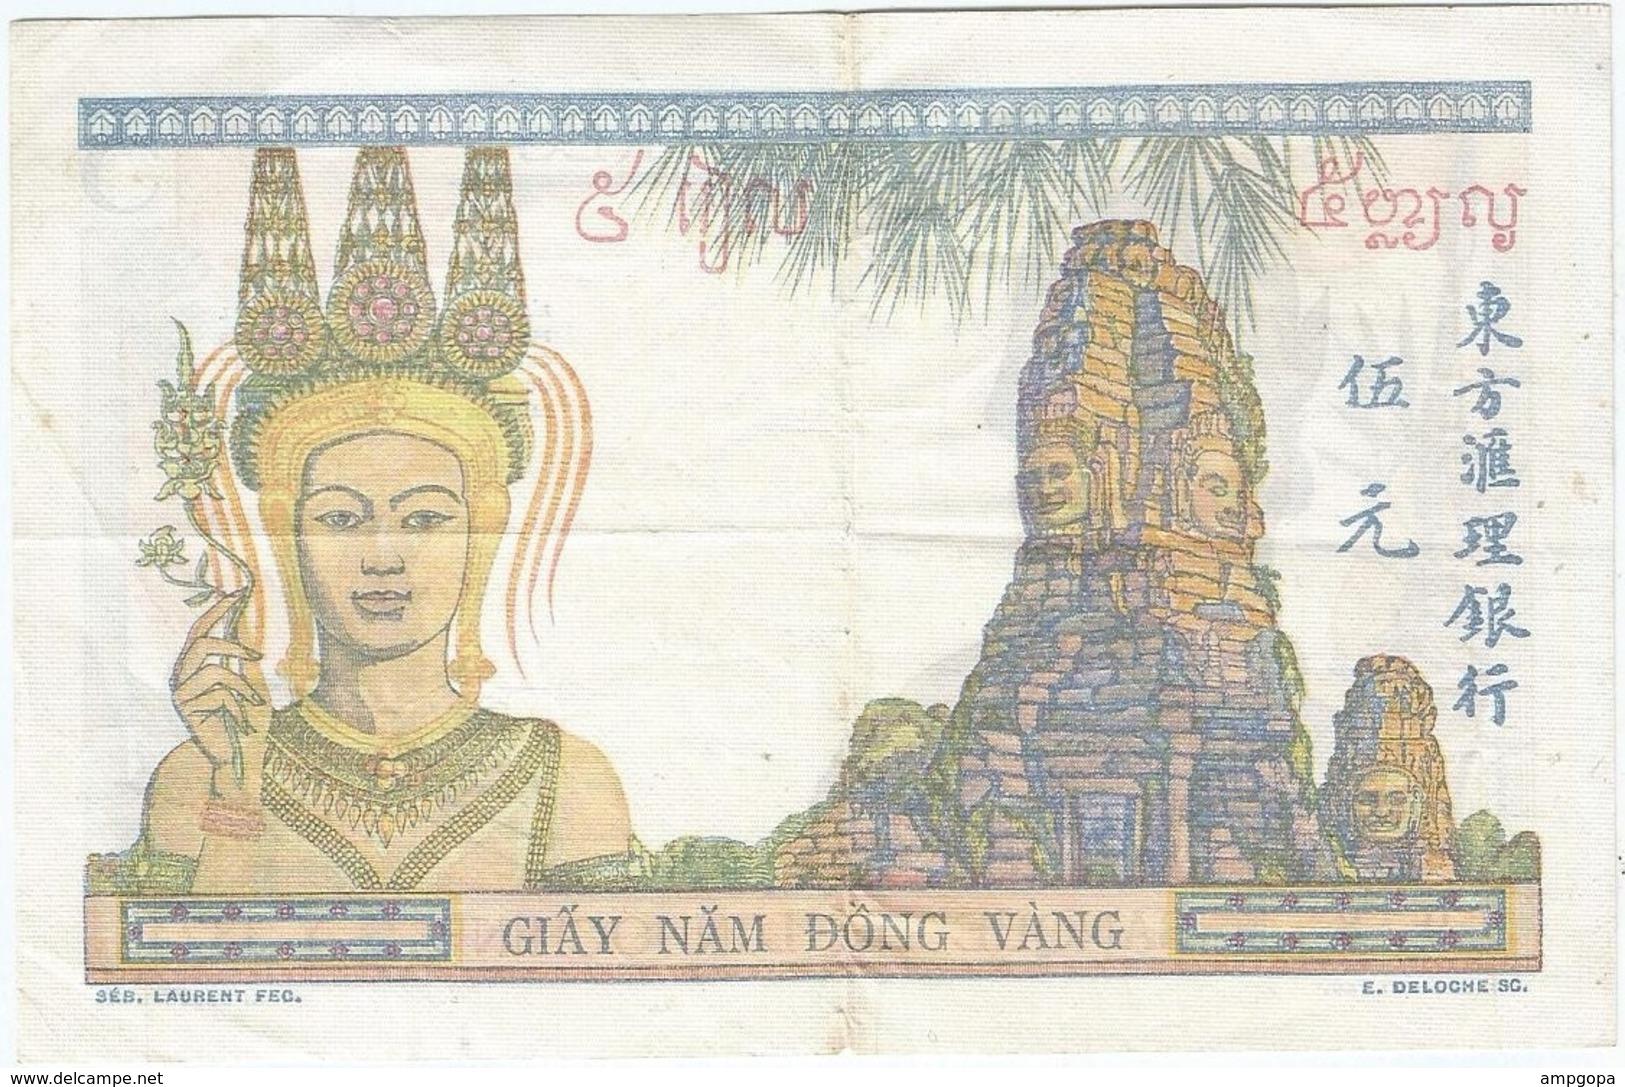 Indochina - Indochine 5 Rupees 1936 Pk 55 C Texto En Lao Antiguo, Valor Sobre Fondo Blanco En Anverso, Firma 1 - Indochina